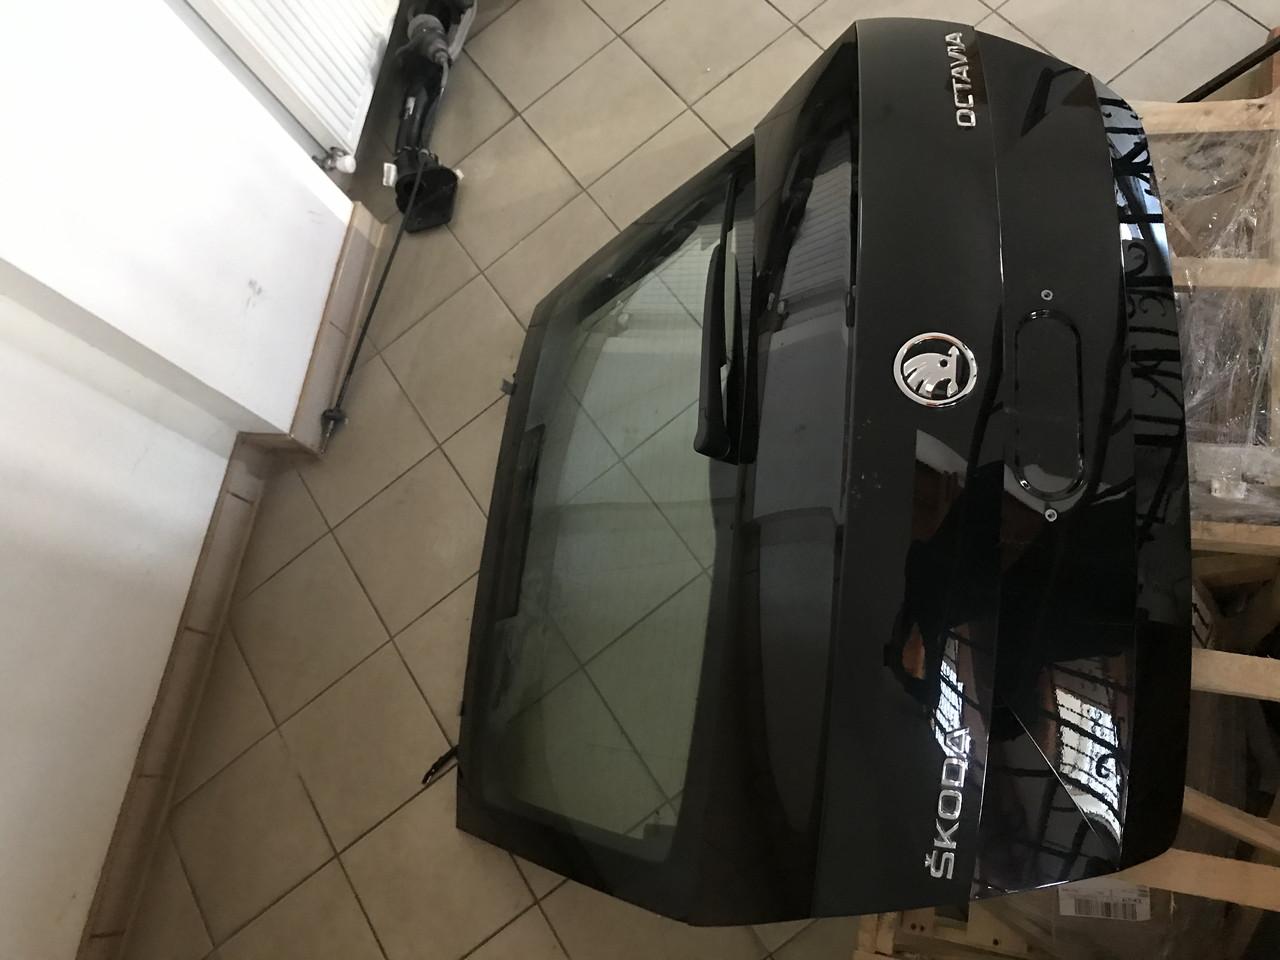 Кришка багажнику ліфт бек Skoda Octavia A7